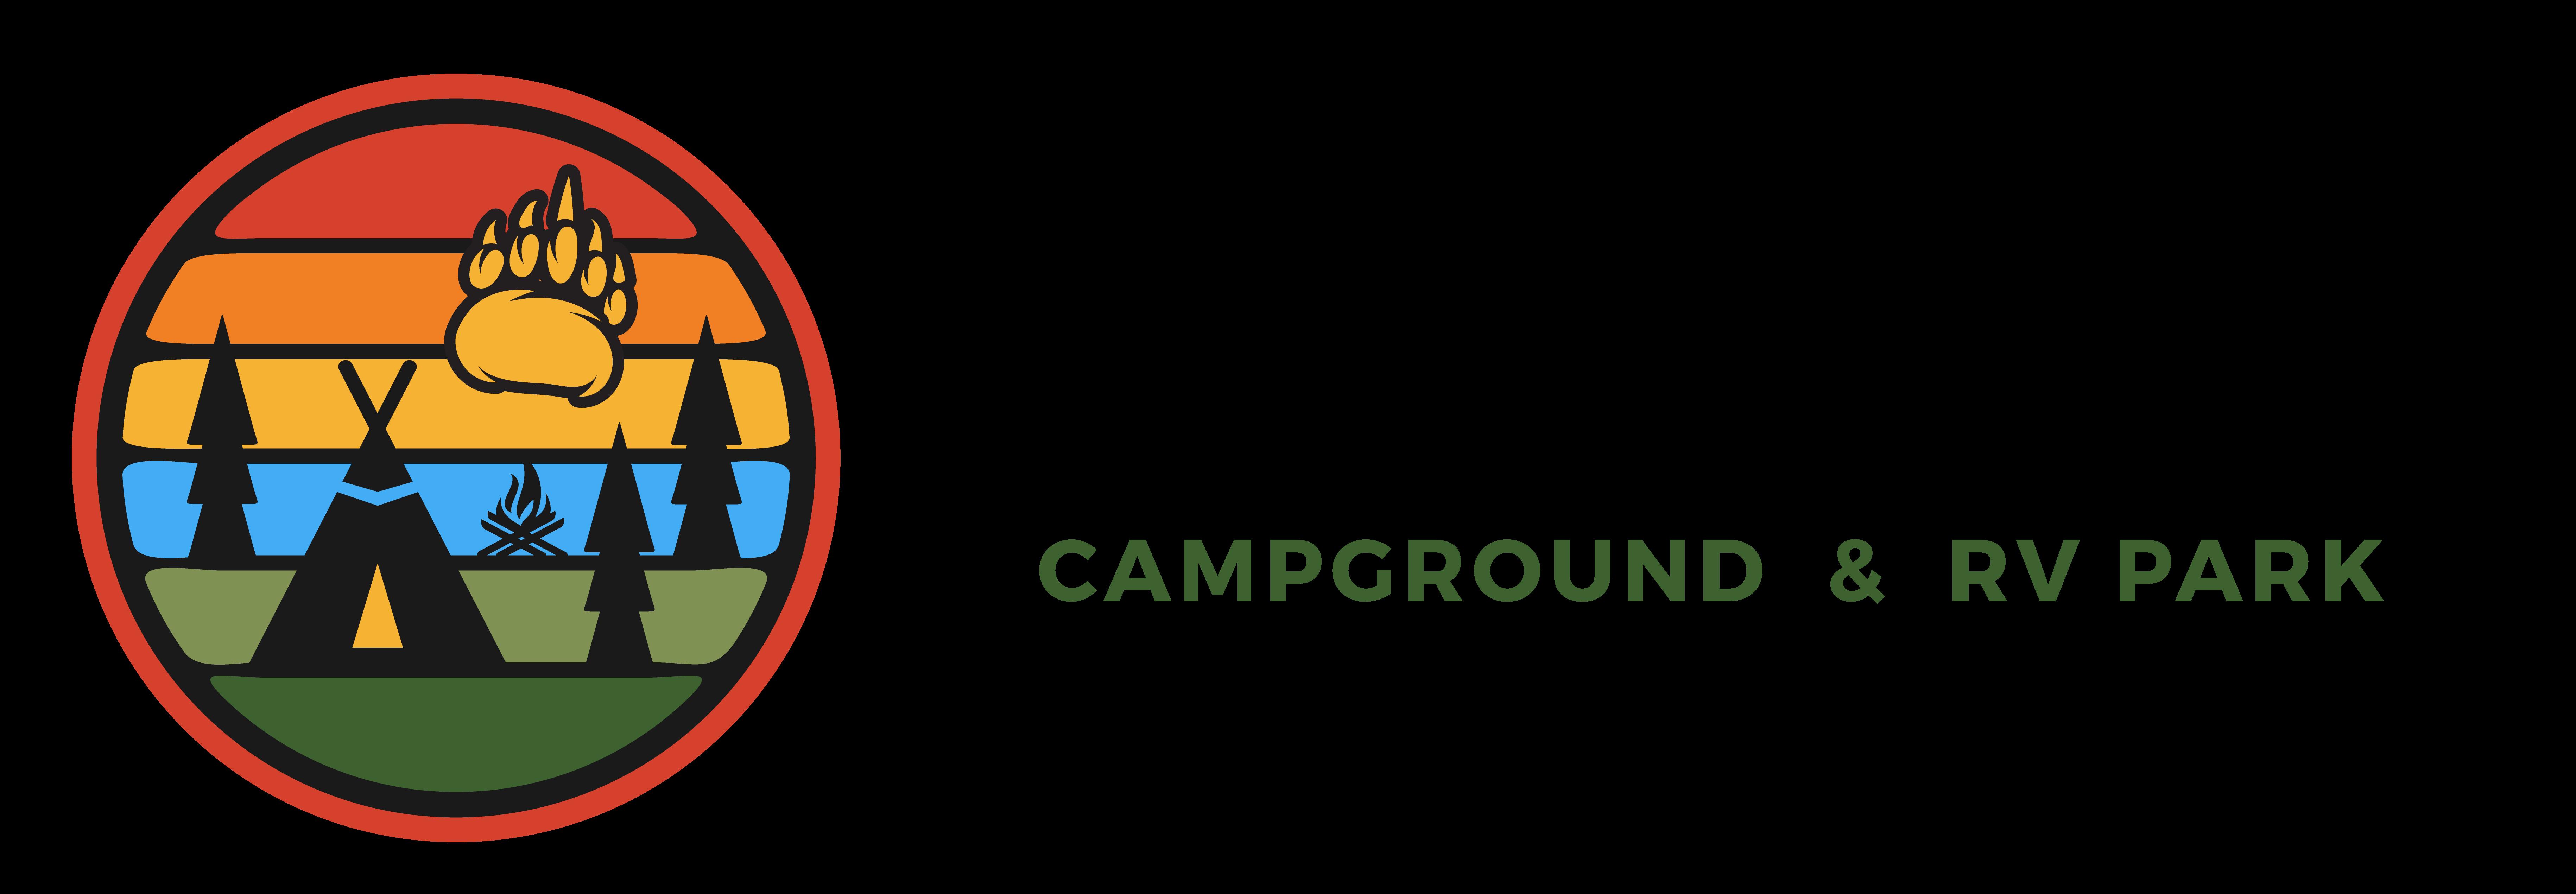 Keeshkeemaquah Campground & RV Park